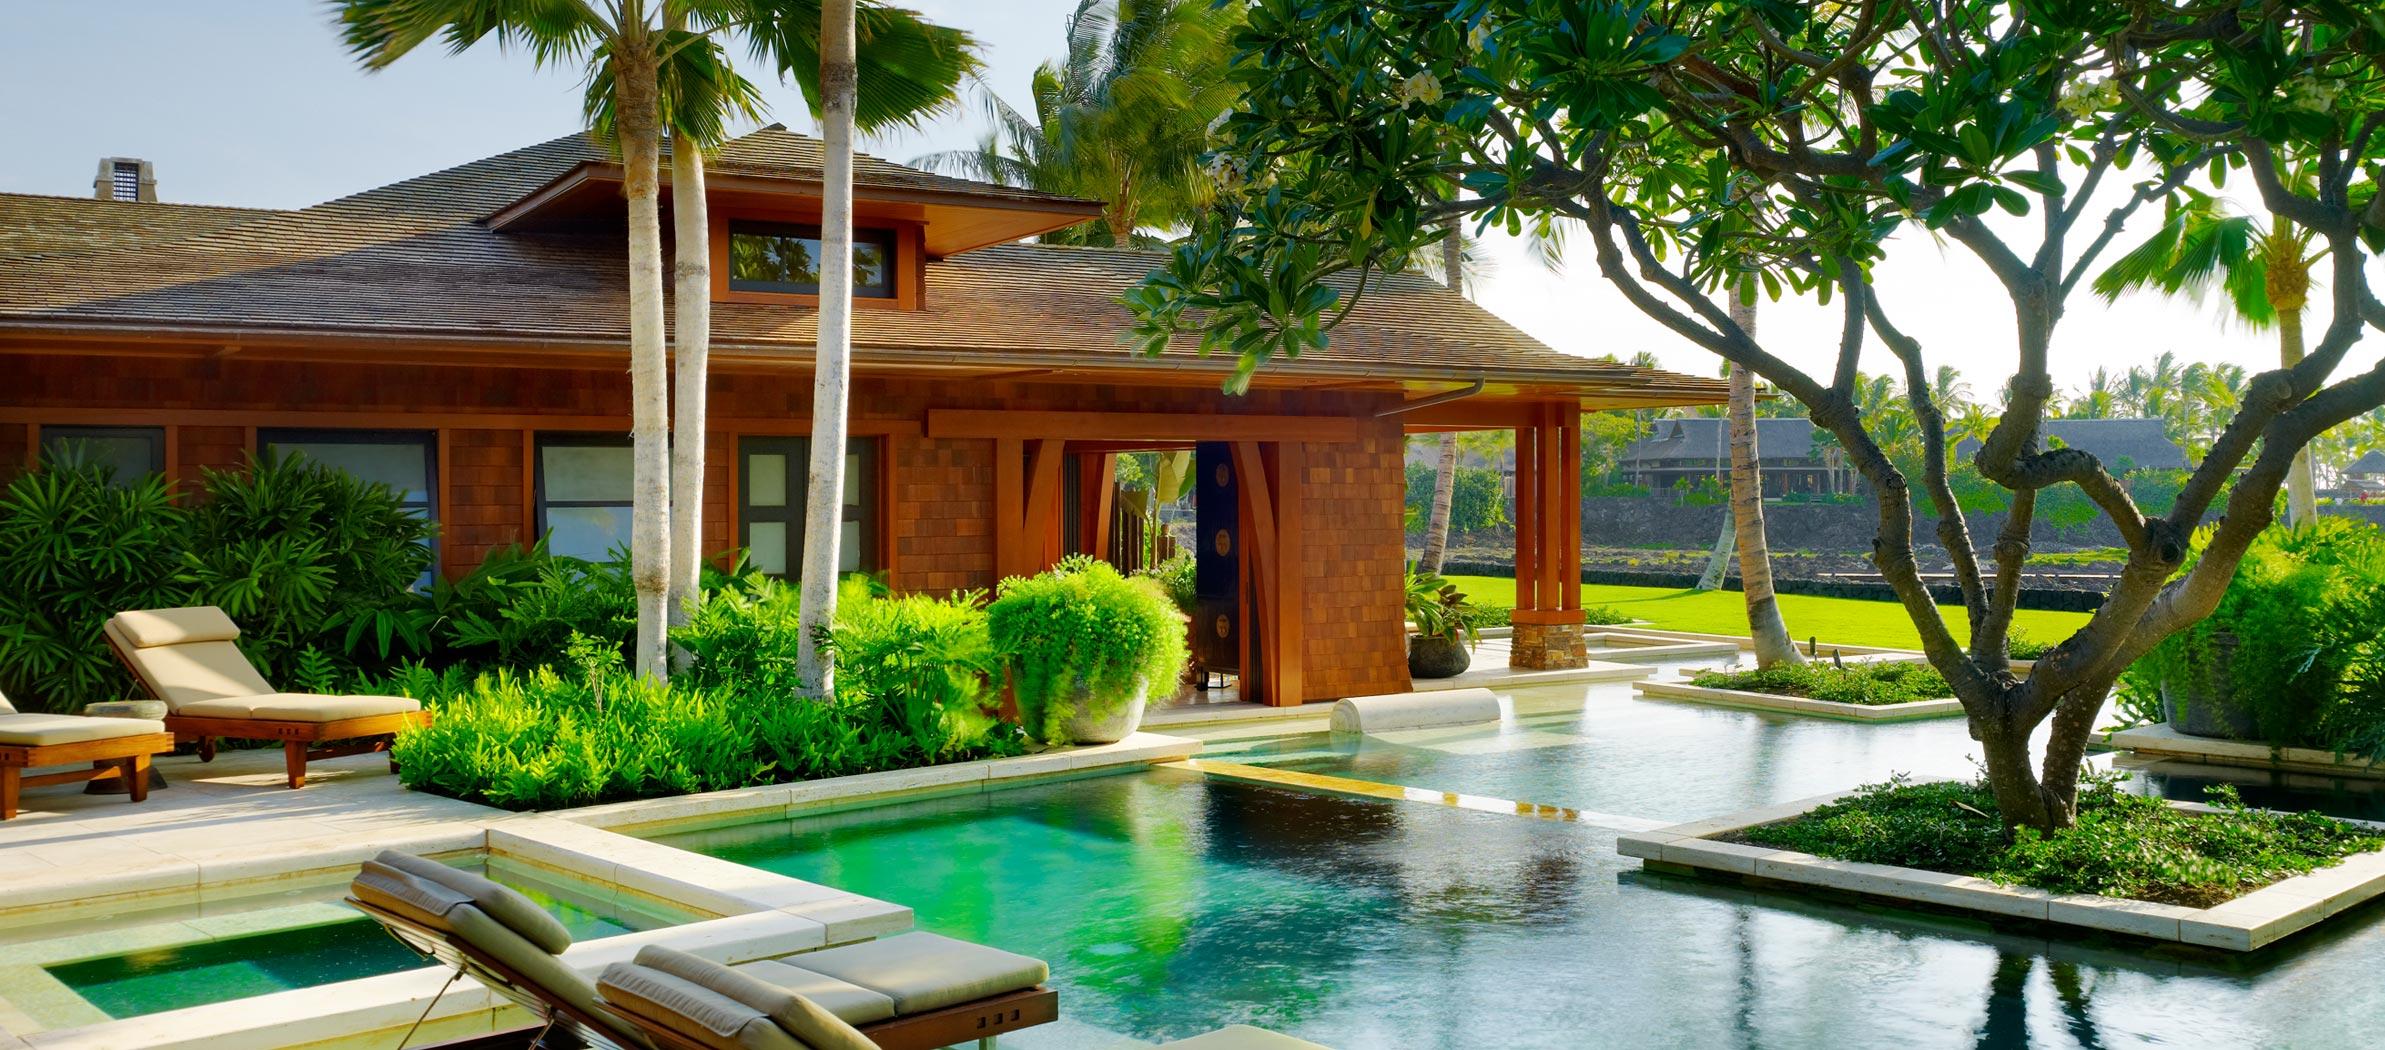 Rent Honolulu Hawaii Homes